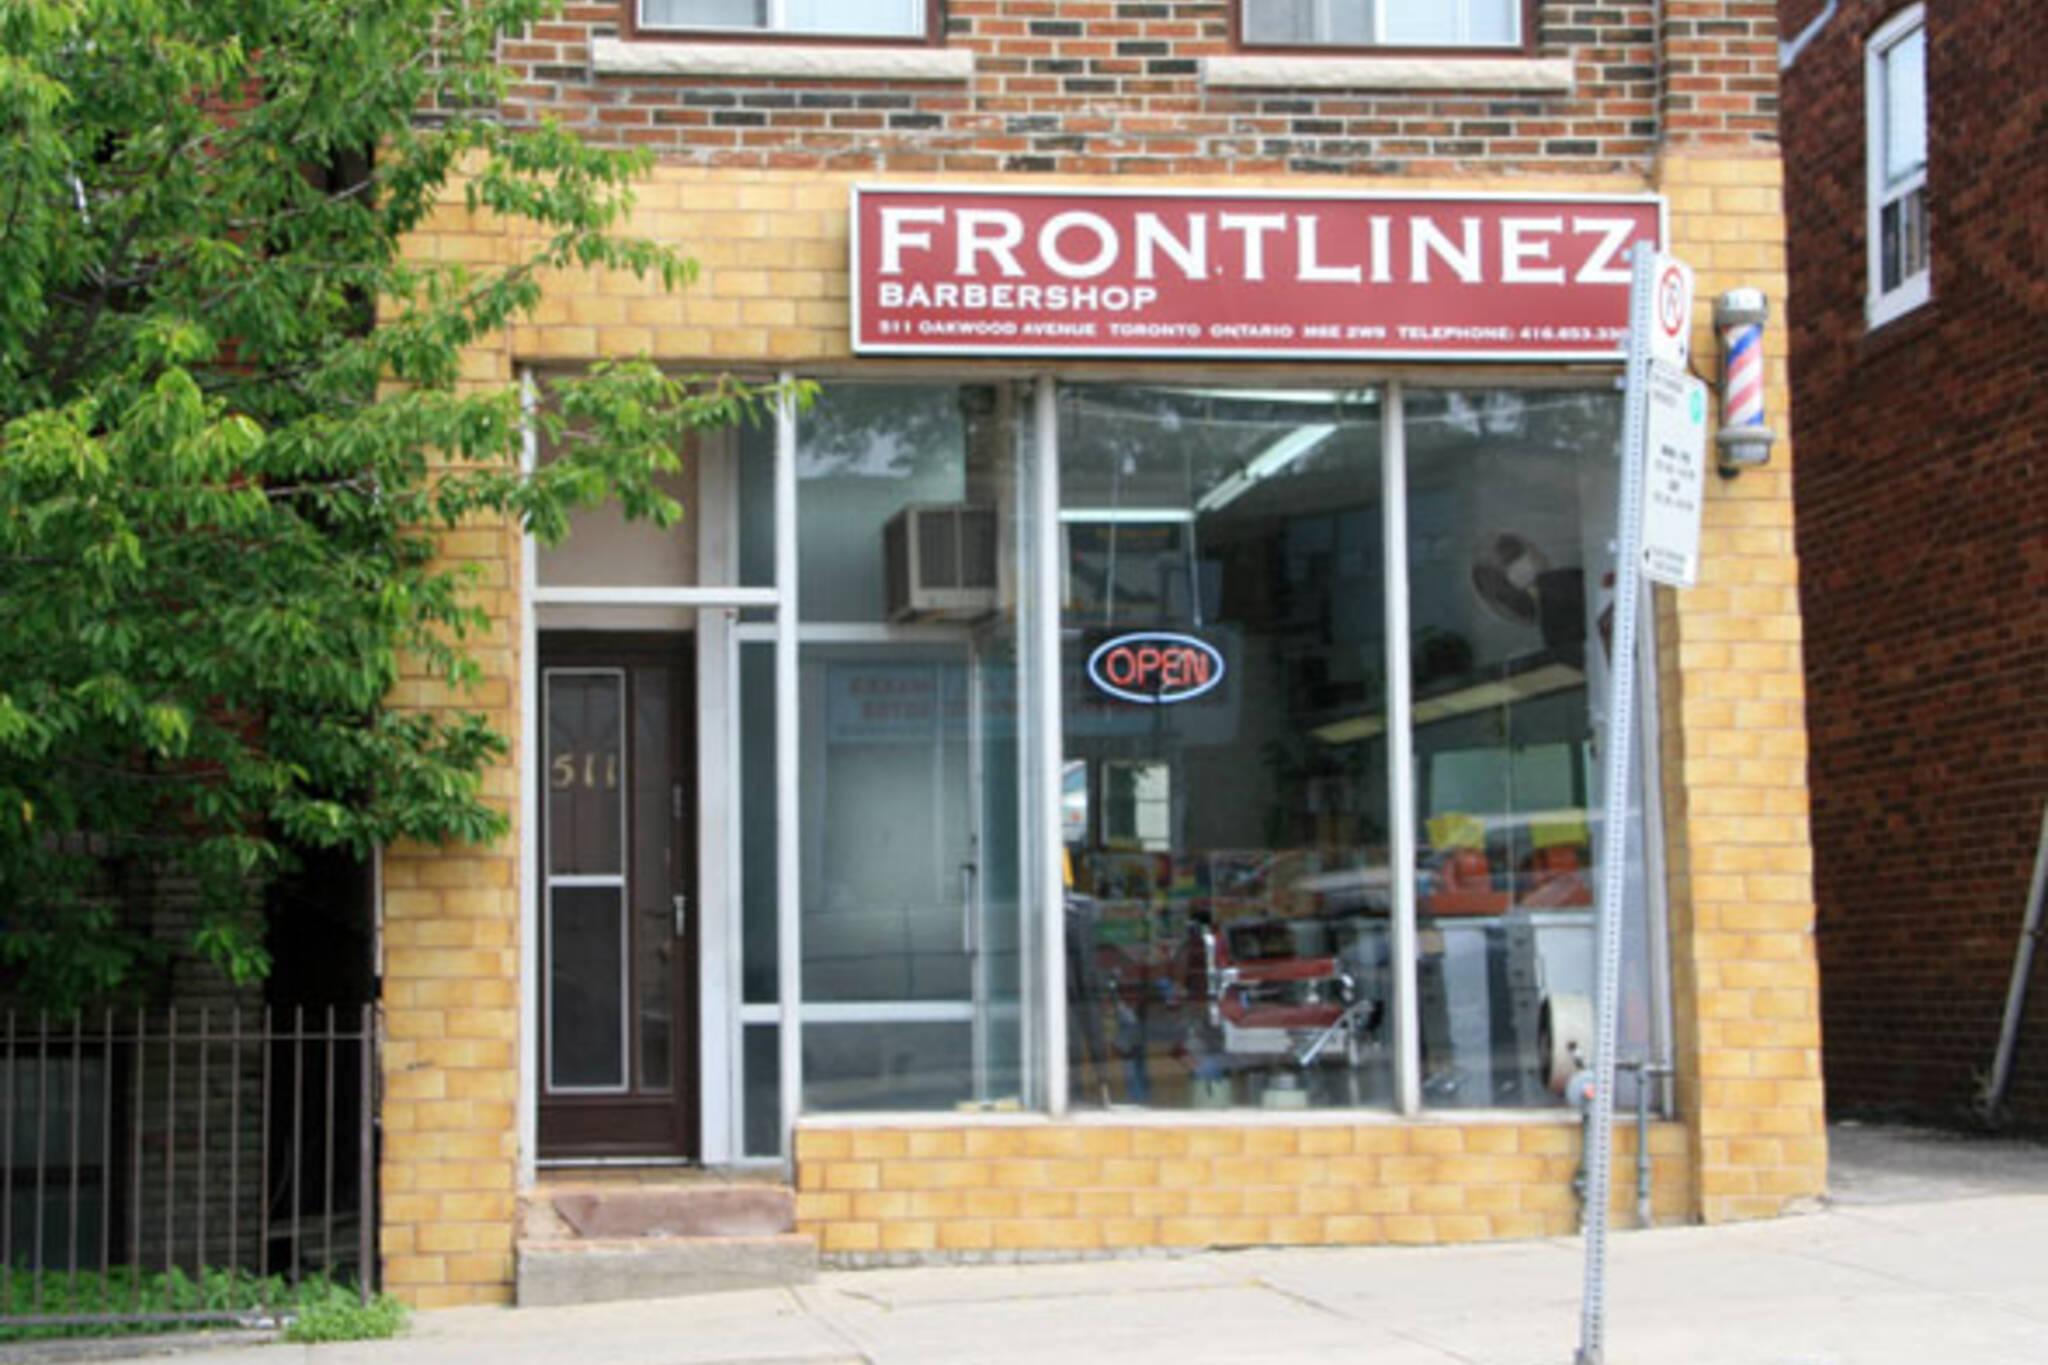 Barber Shop Frontlinez